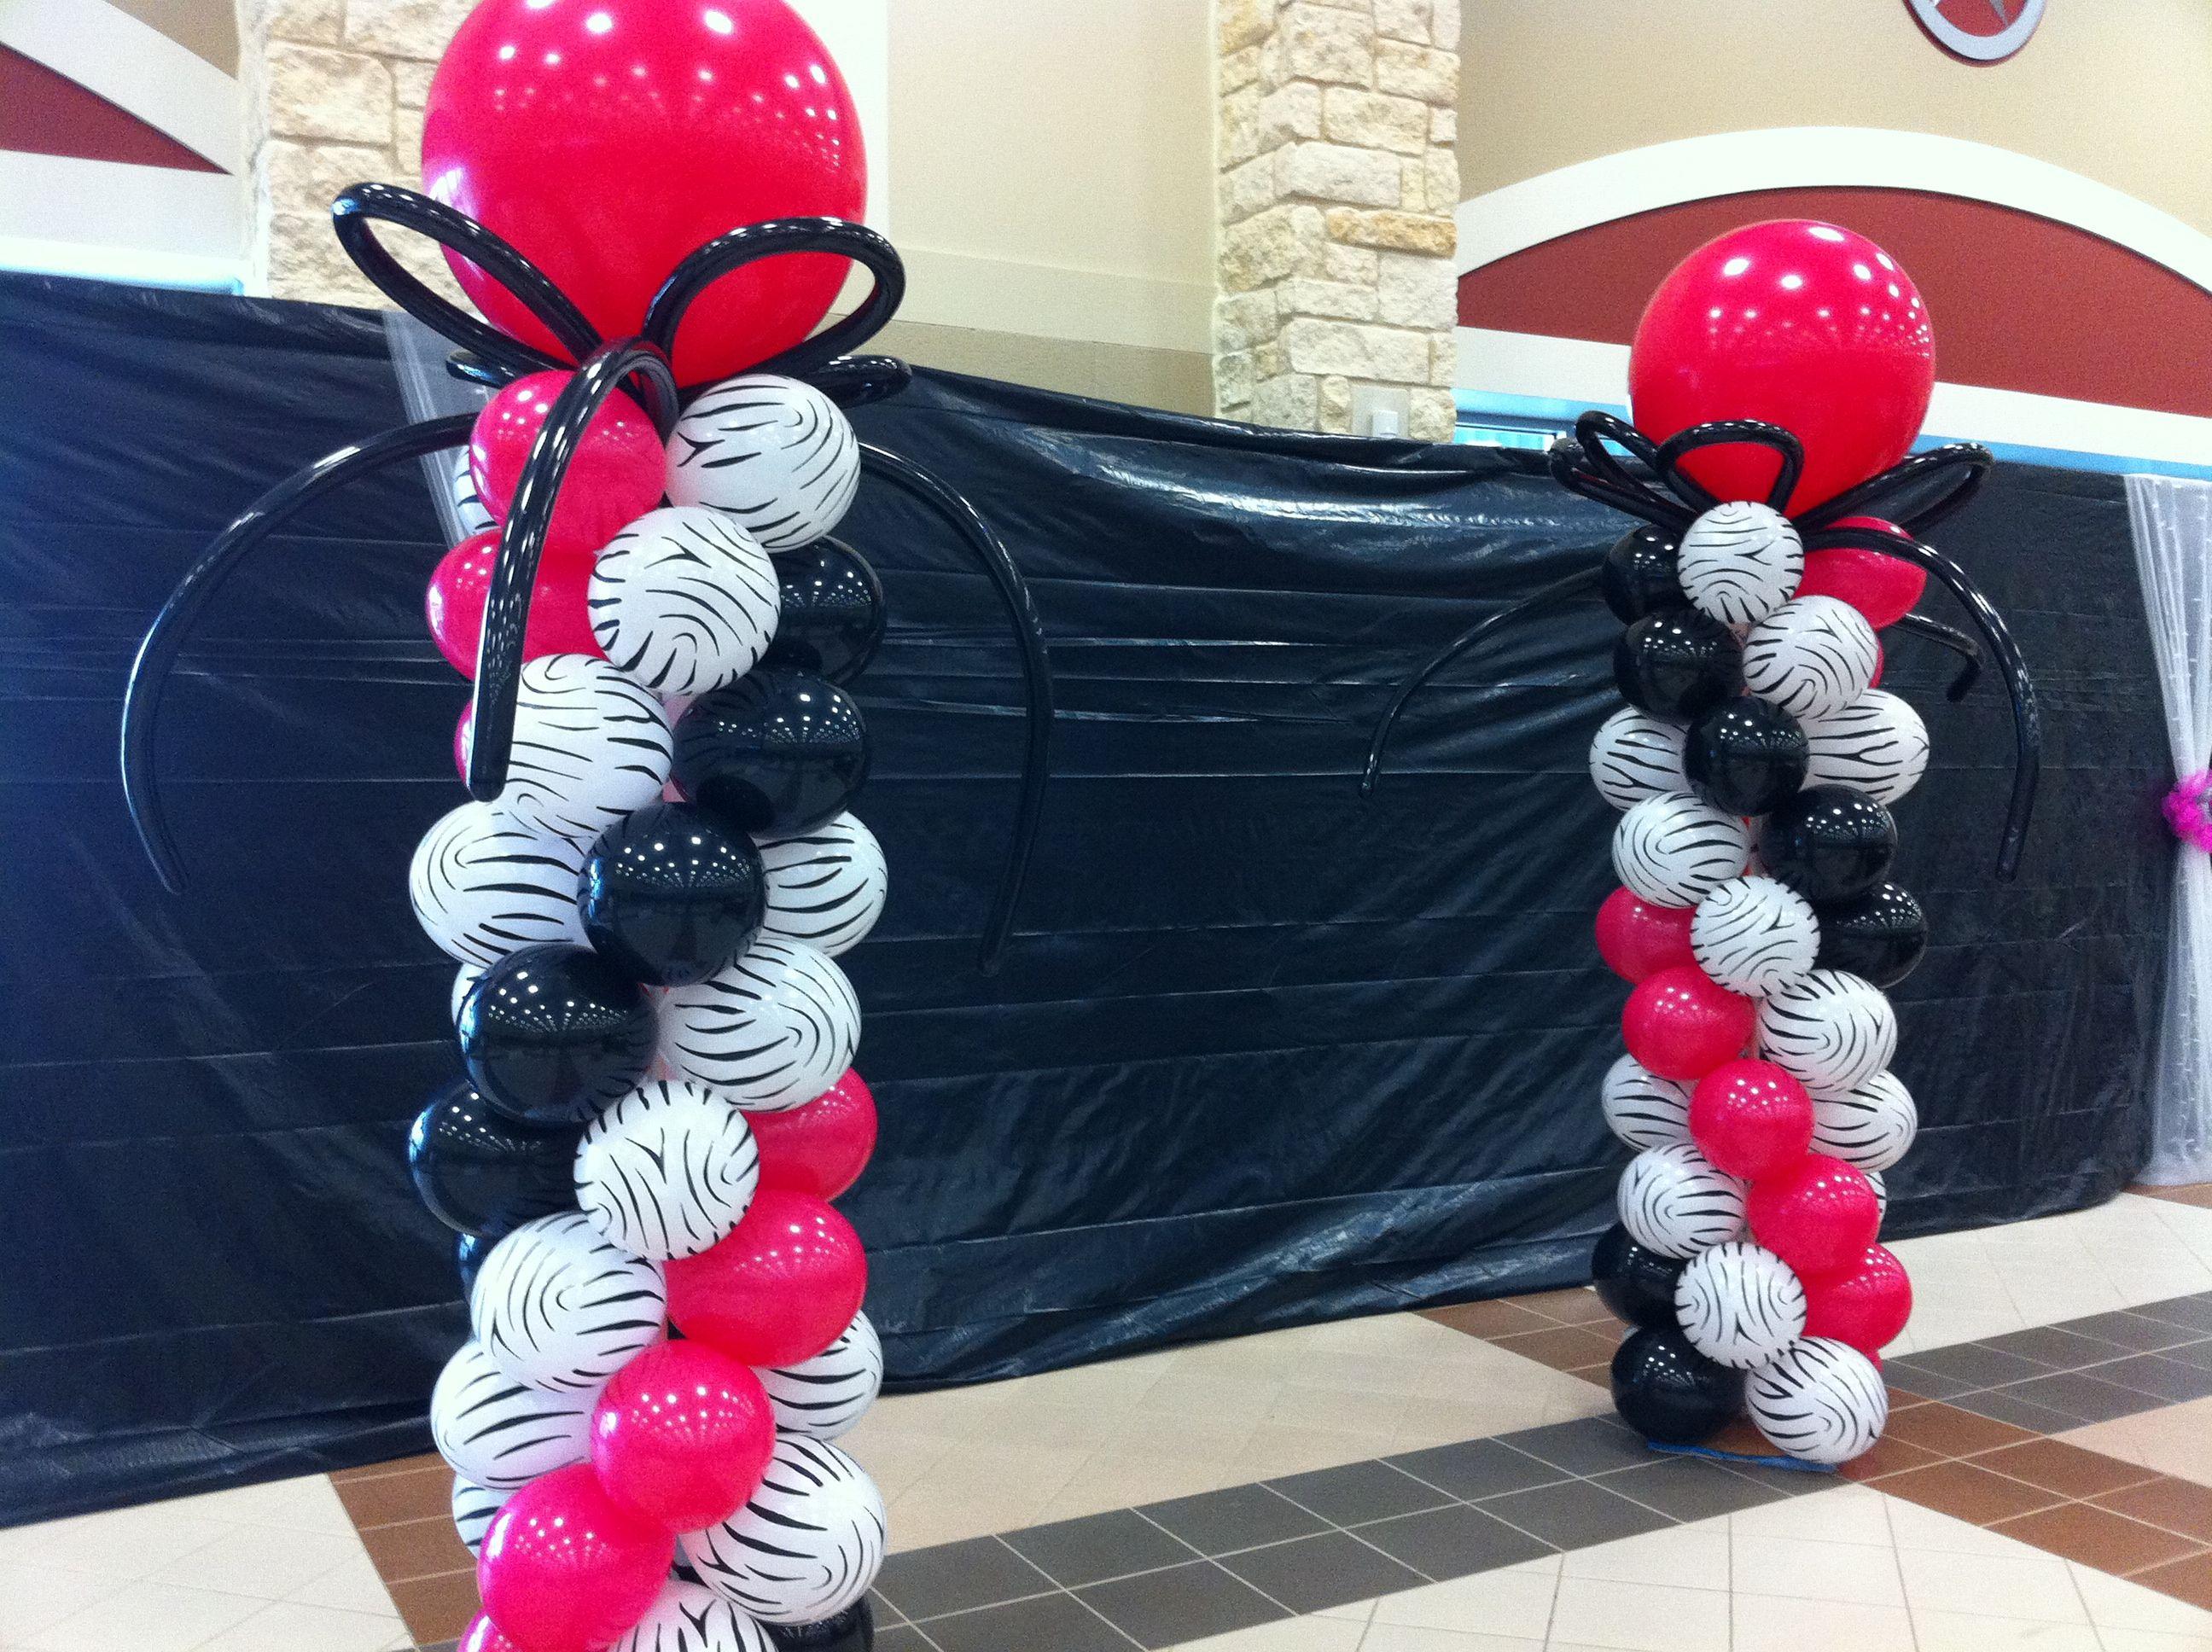 Zebra wedding decorations  zebra print and pink wedding ideas  Specializing in Fort Bend